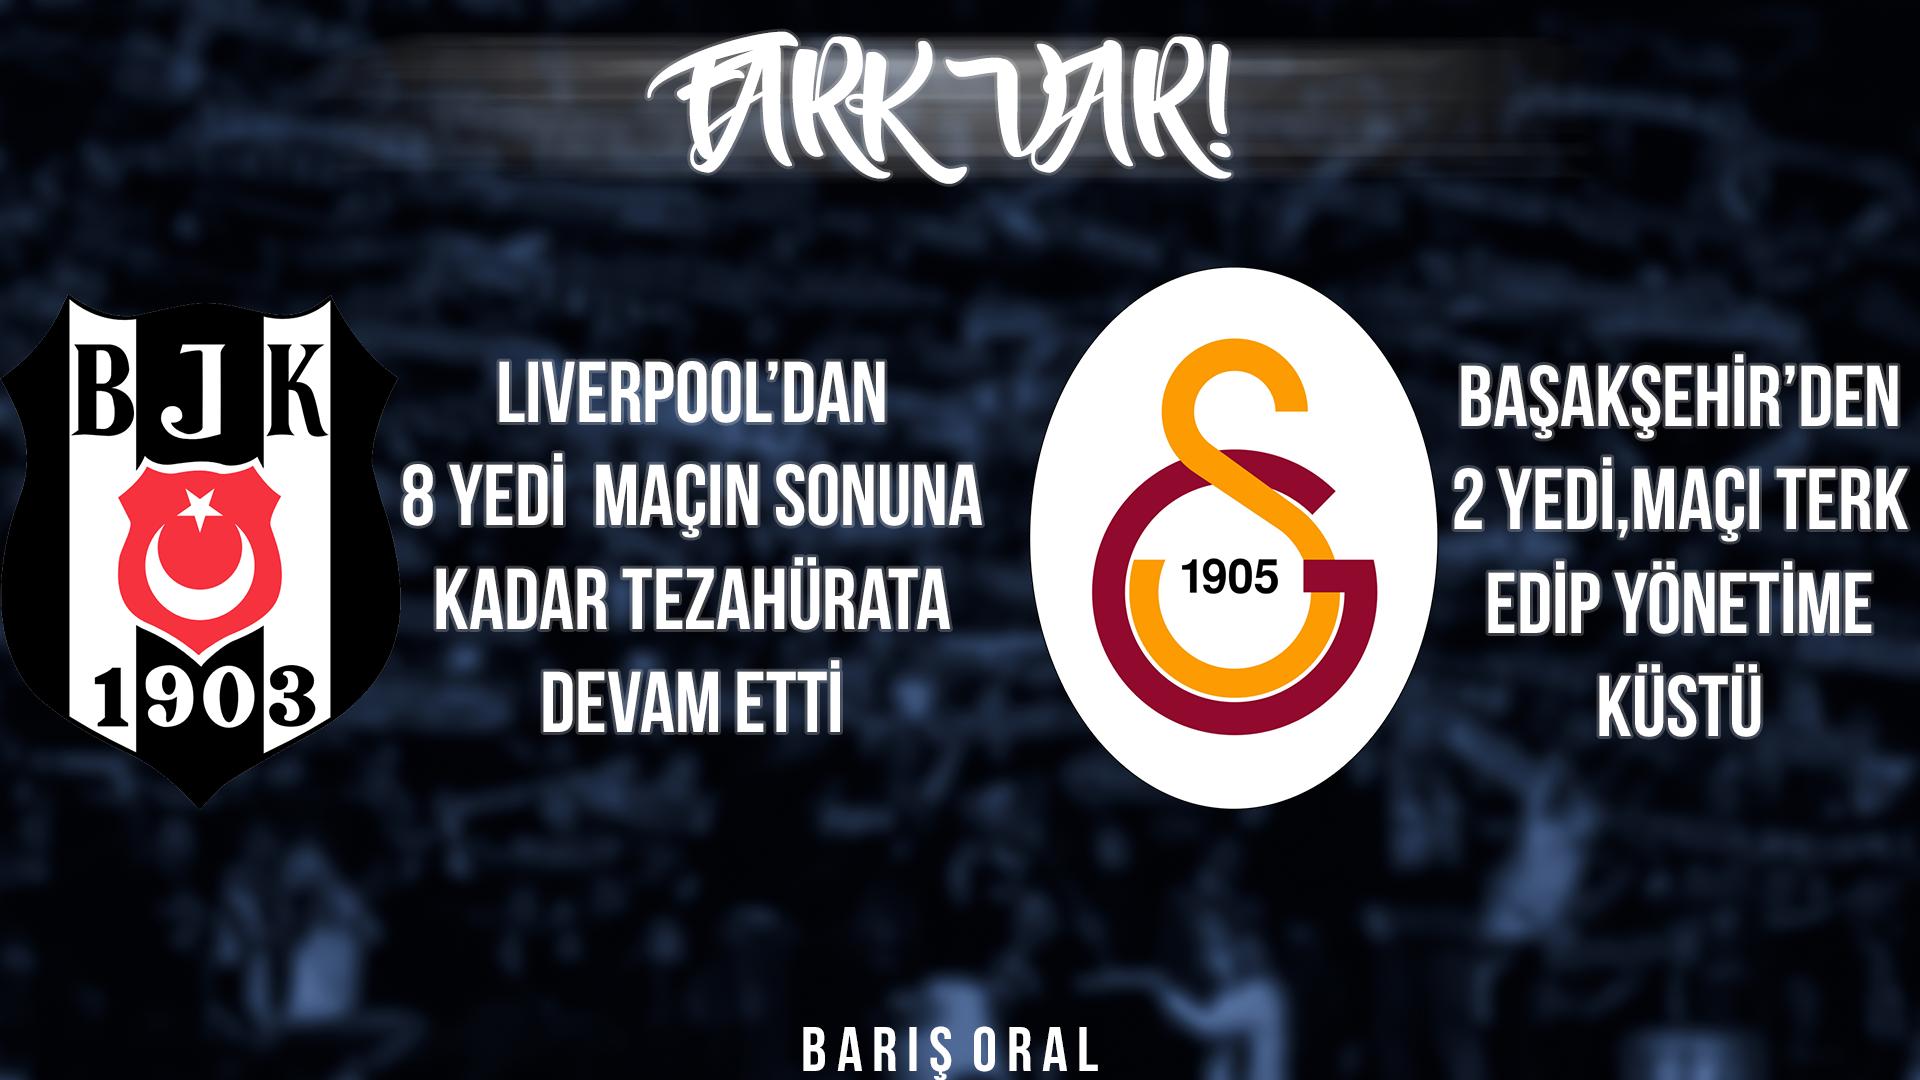 #caps #wallpaper #beşiktaş #fenerbahçe #galatasaray #trabzonspor #futbol #liverpool #tff